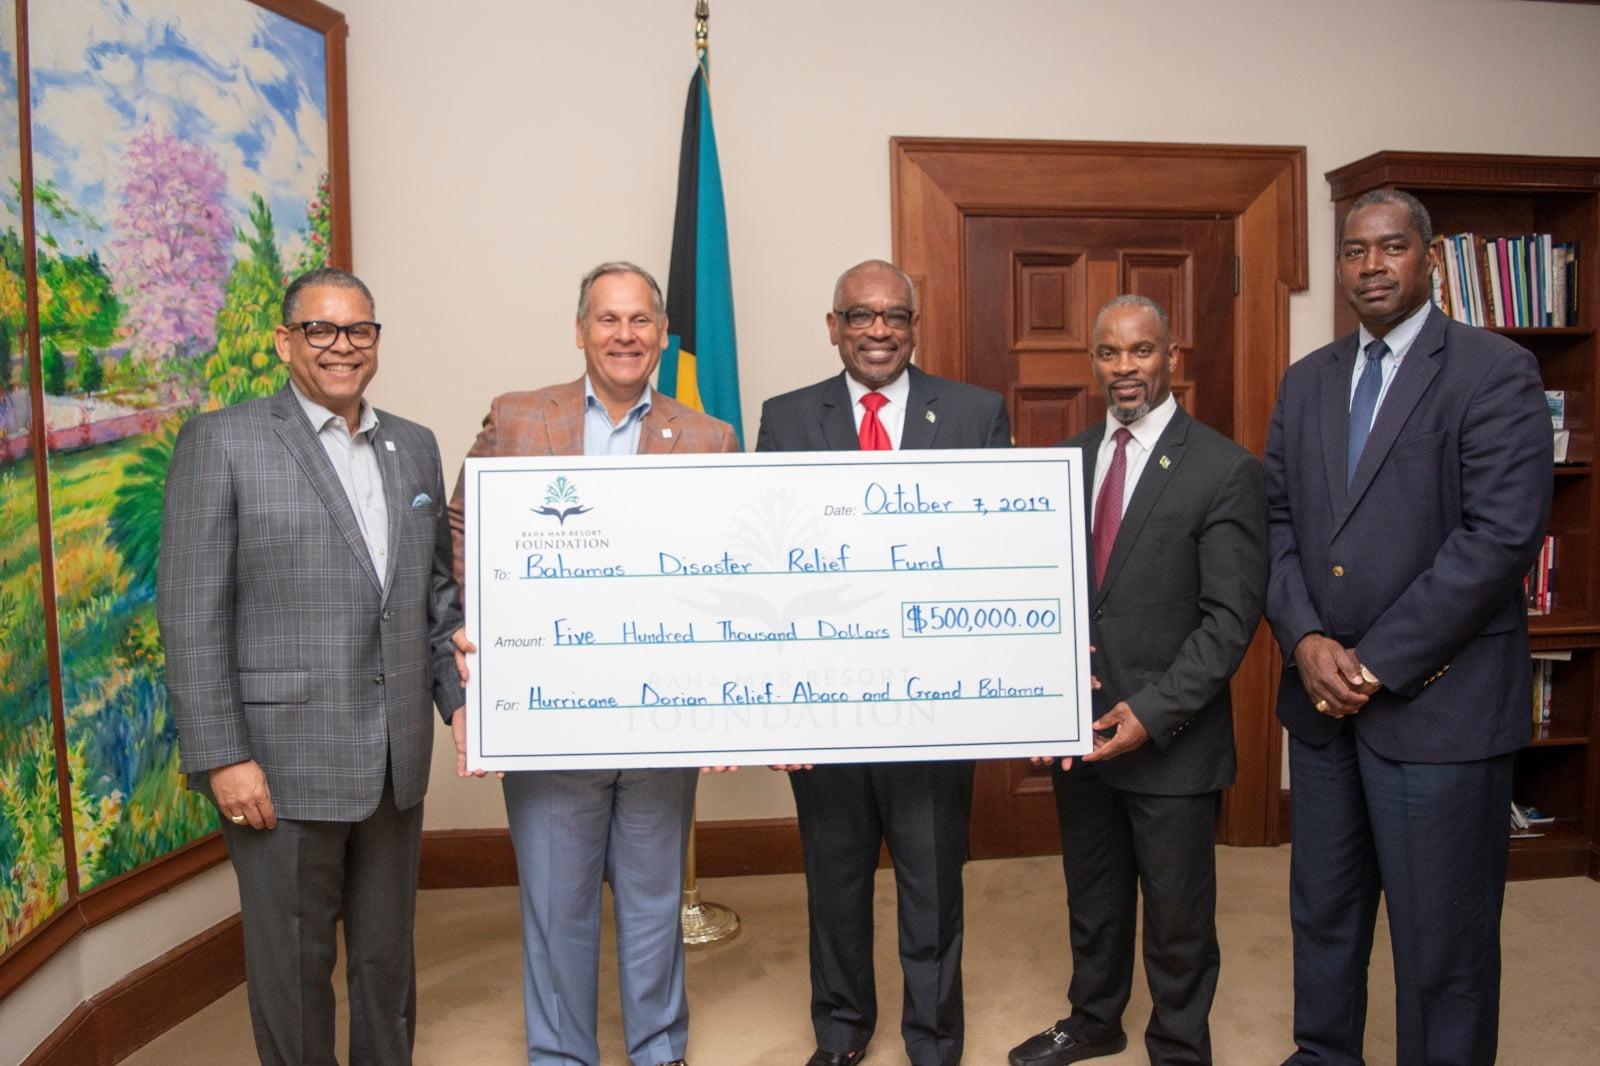 Baha Mar donates $500,000 for Hurricane Dorian relief